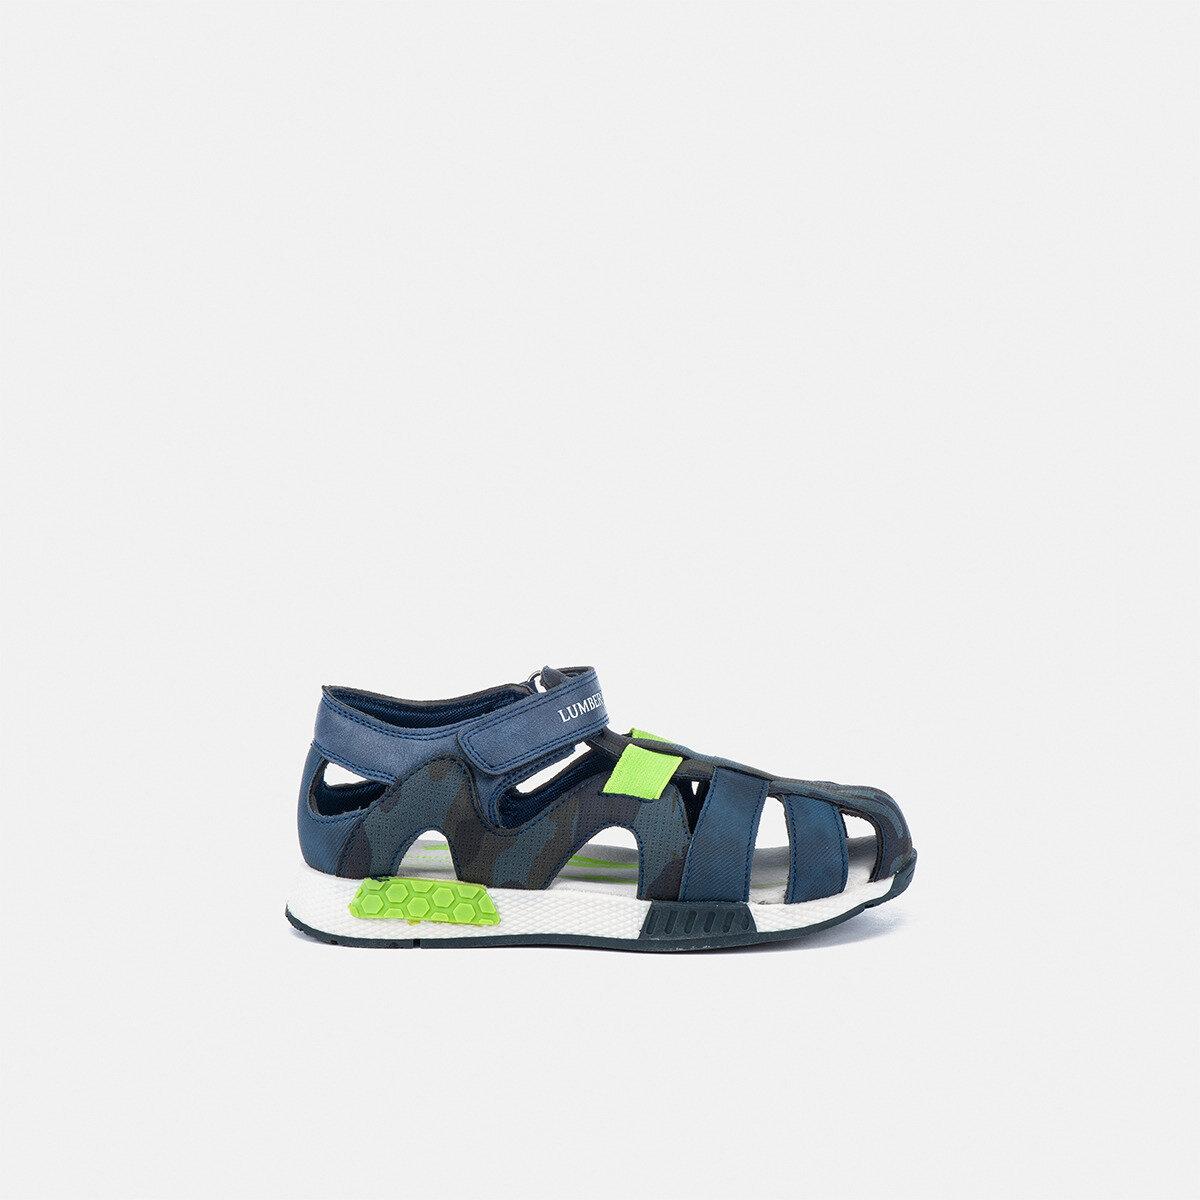 CORSY NAVY BLUE/ACID GREEN Boy Sandals